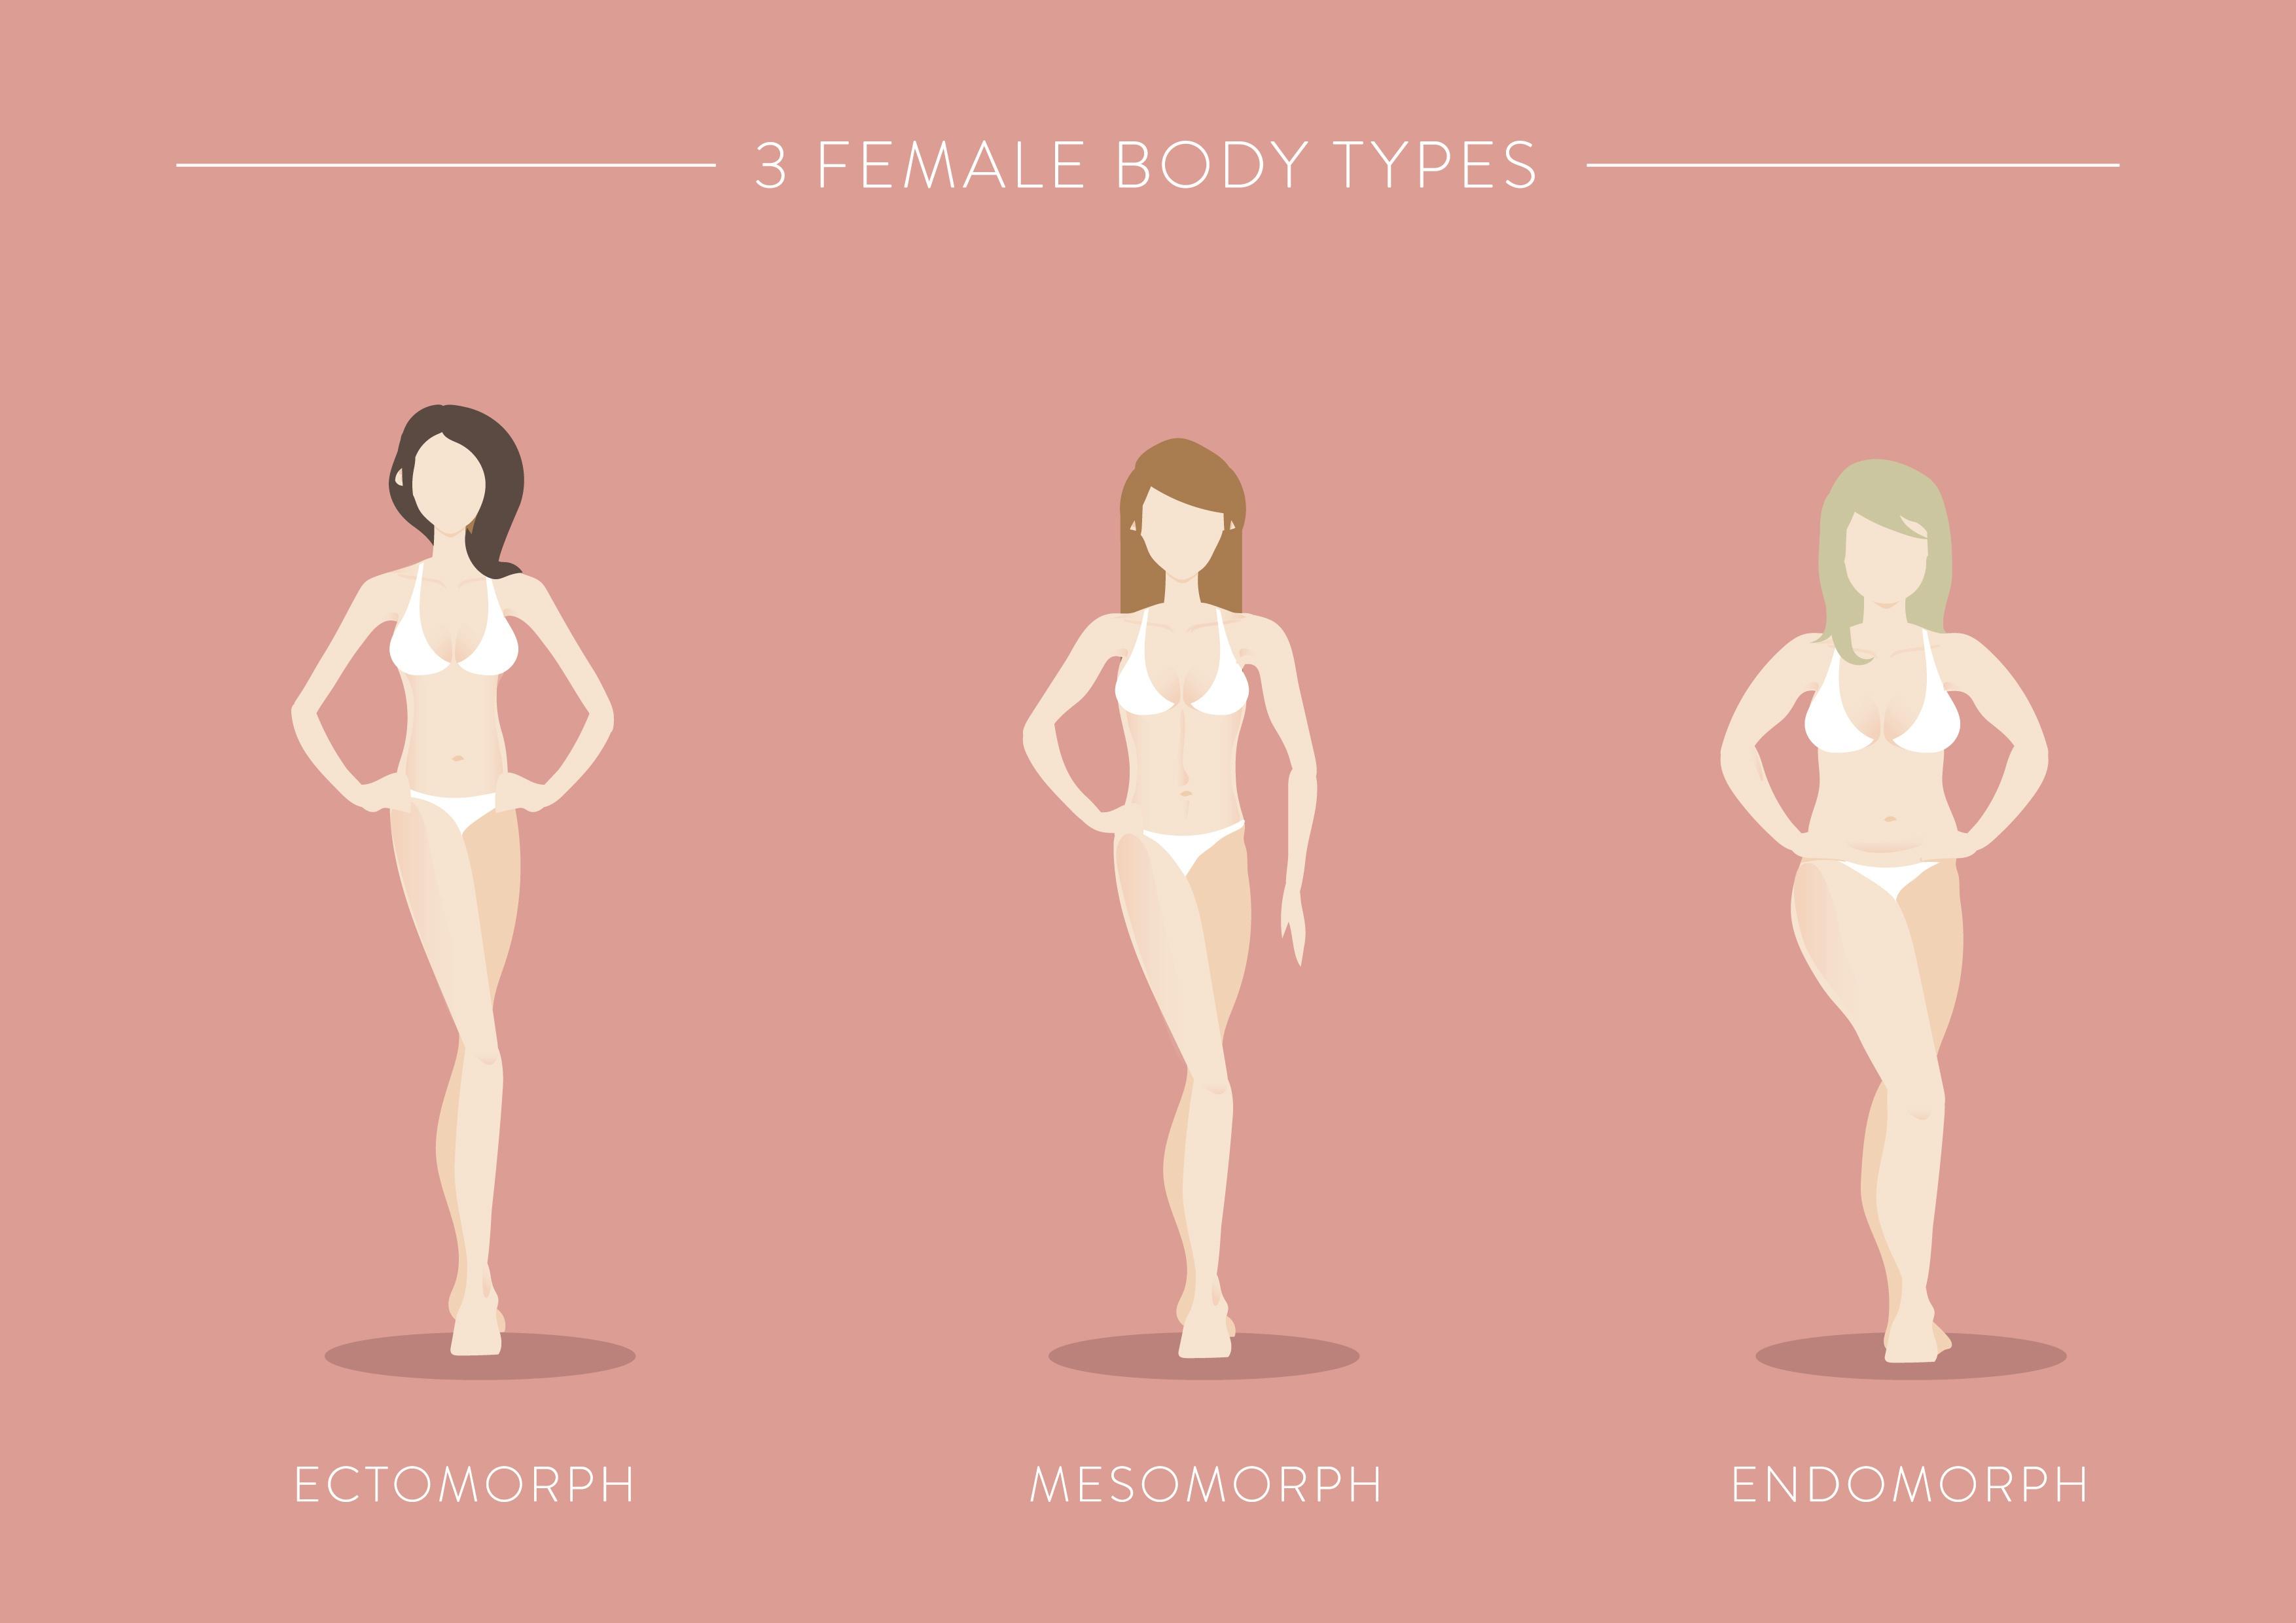 female body types ectomorph mesomorph endomorph